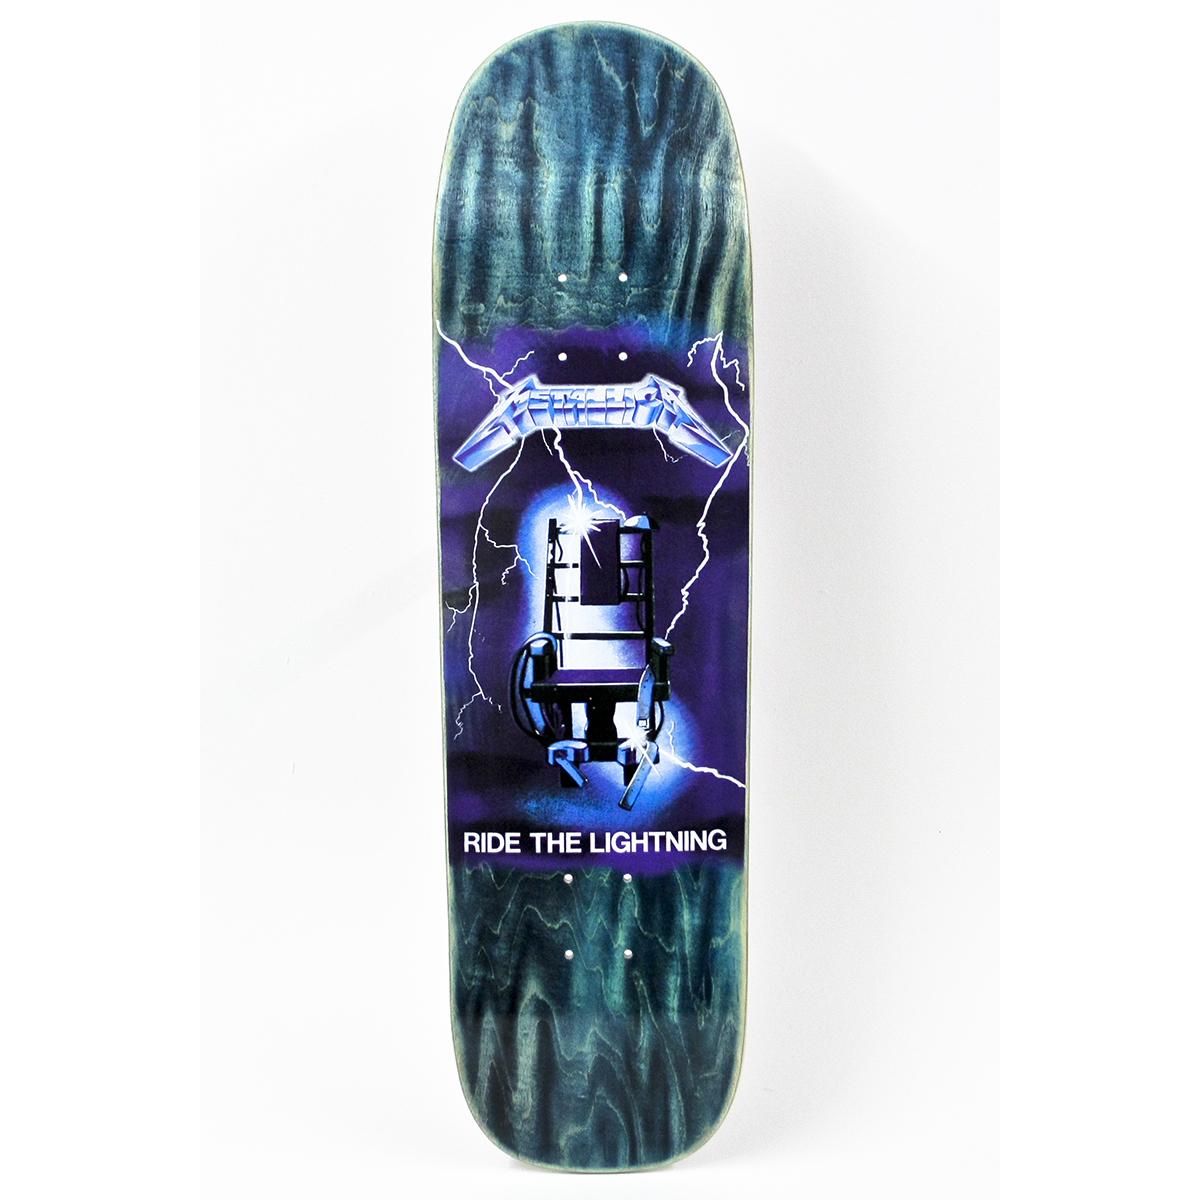 Ride The Lightning – Pool Skateboard - Metallica